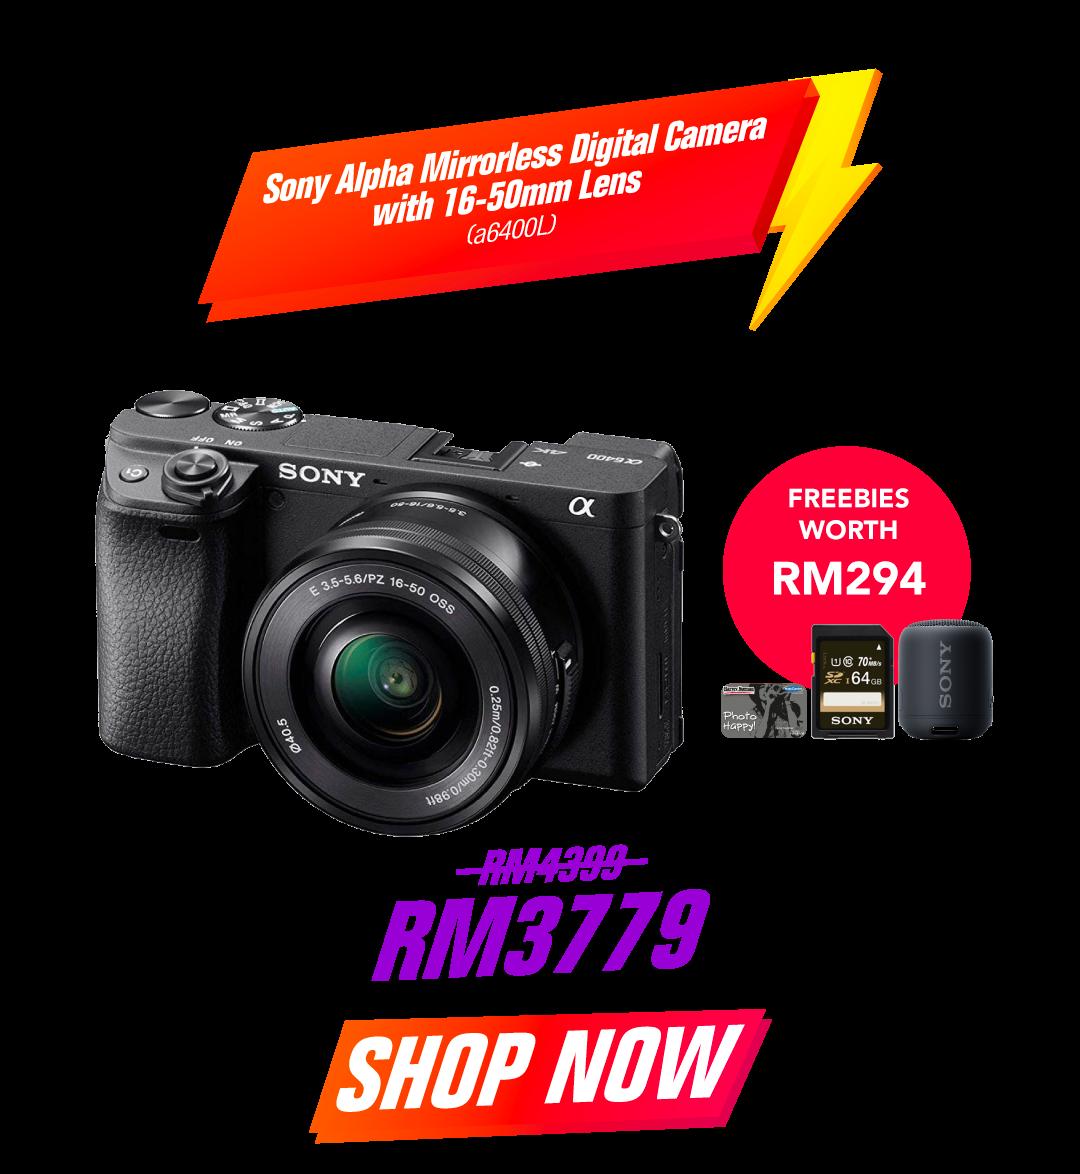 Sony Alpha Mirrorless Digital Camera with 16-50mm Lens a6400L